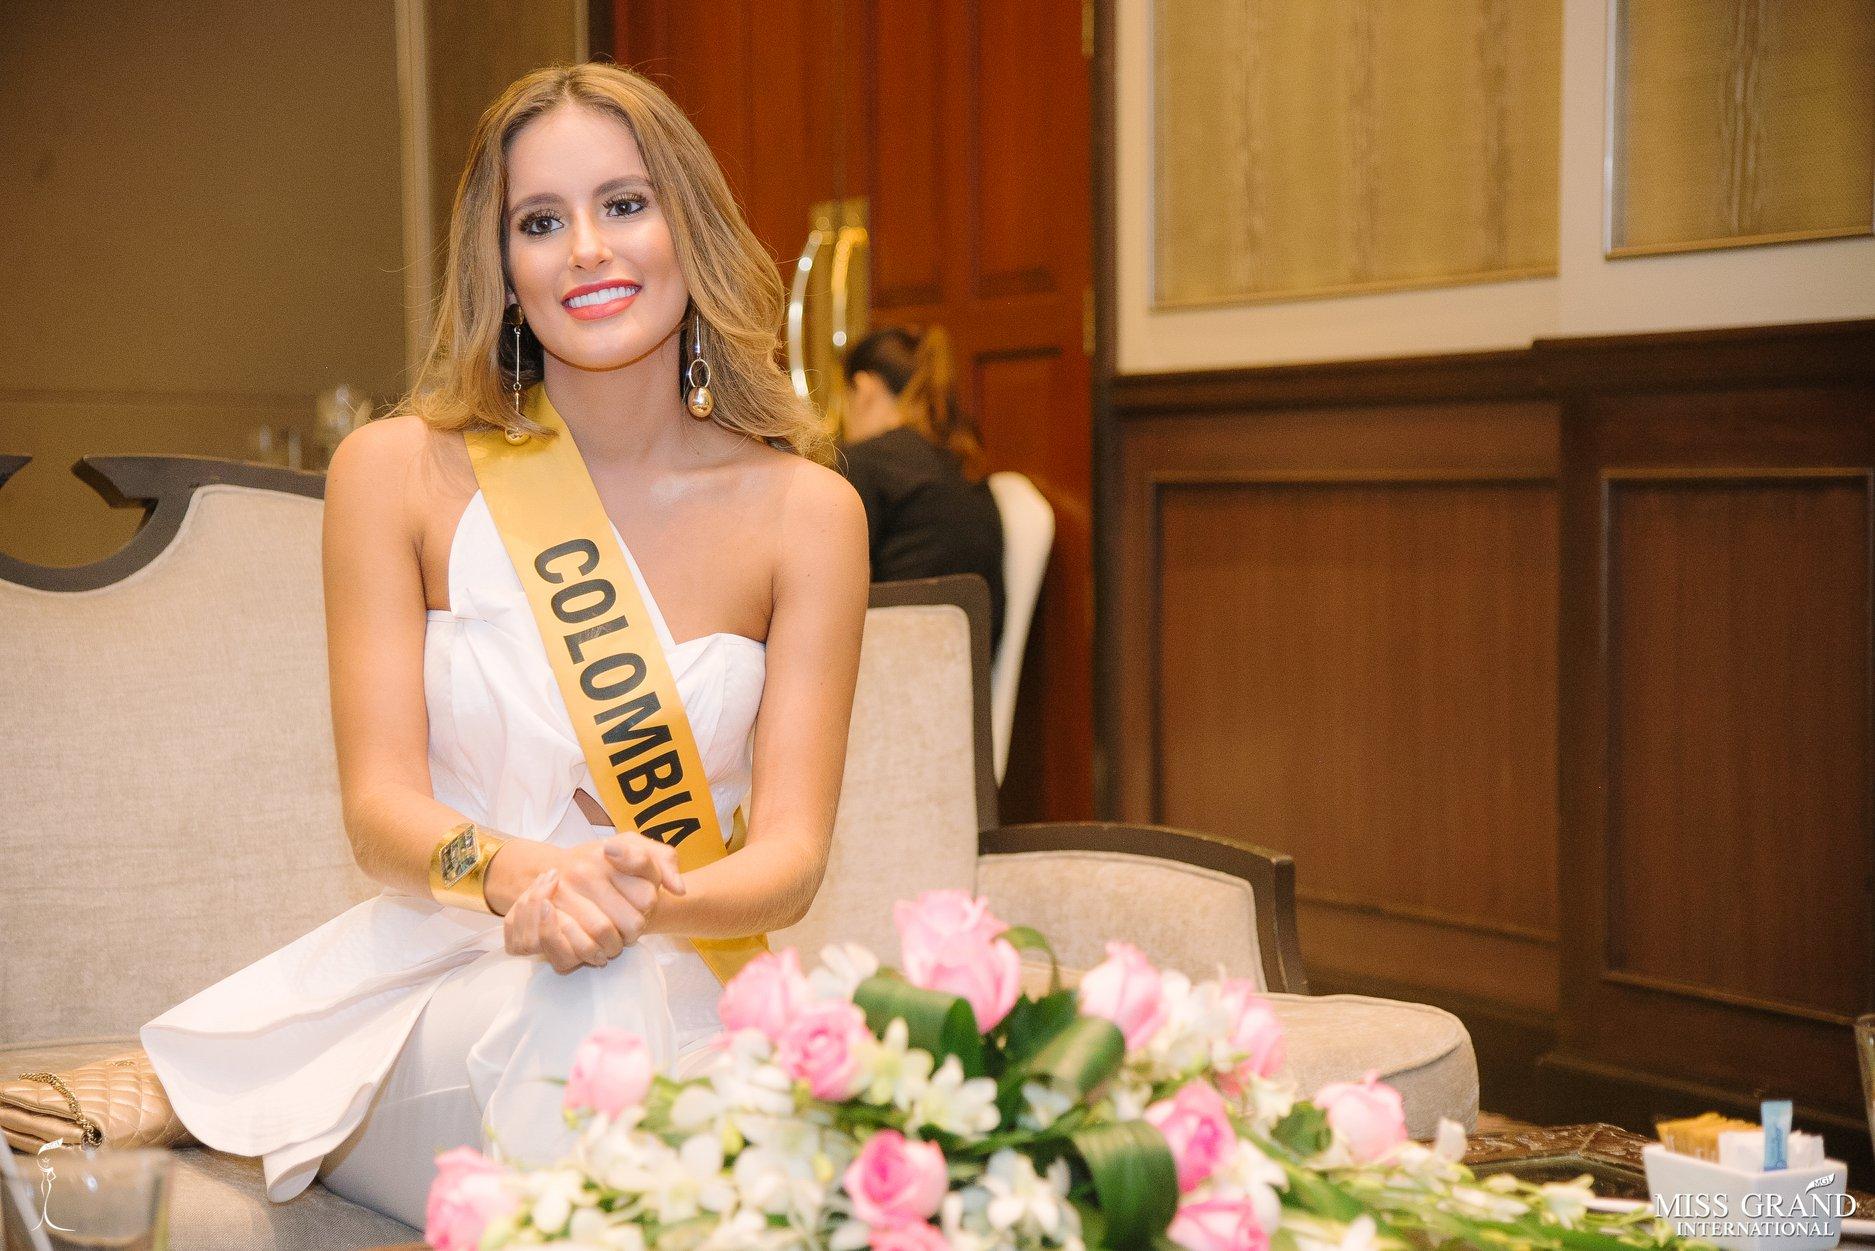 sheyla quizena, miss grand colombia 2018. - Página 6 I2642s10